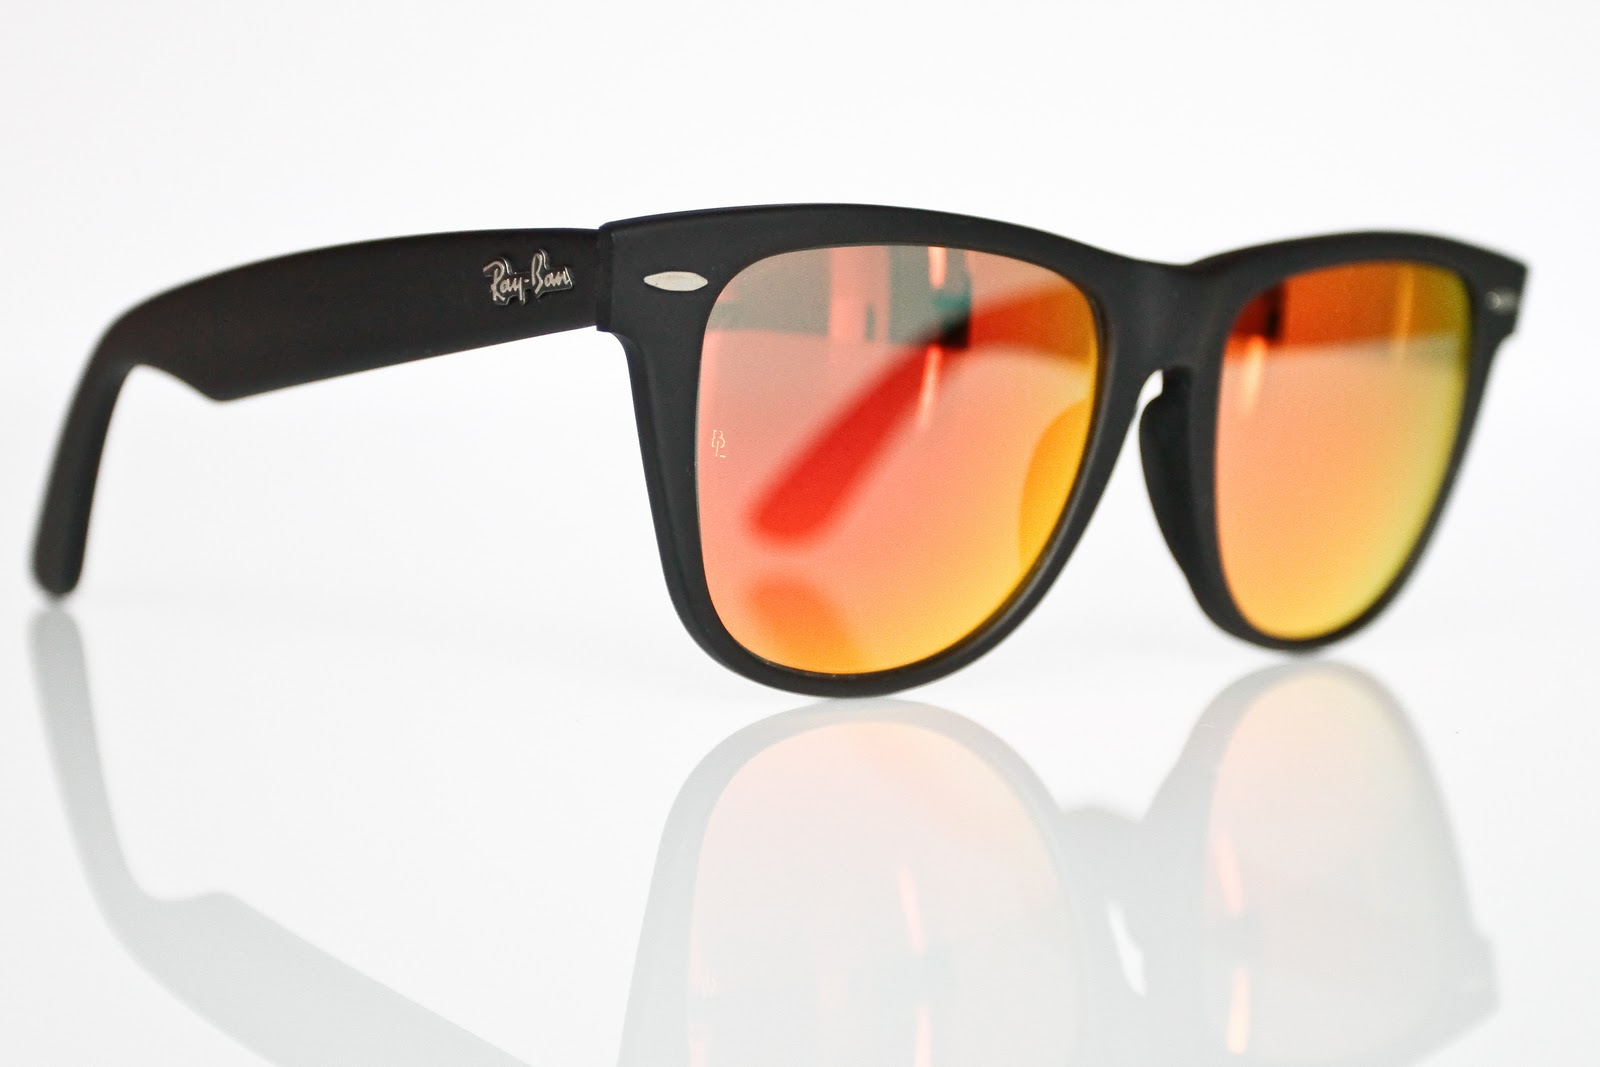 wayfarer 2 sunglasses fupm  wayfarer 2 sunglasses